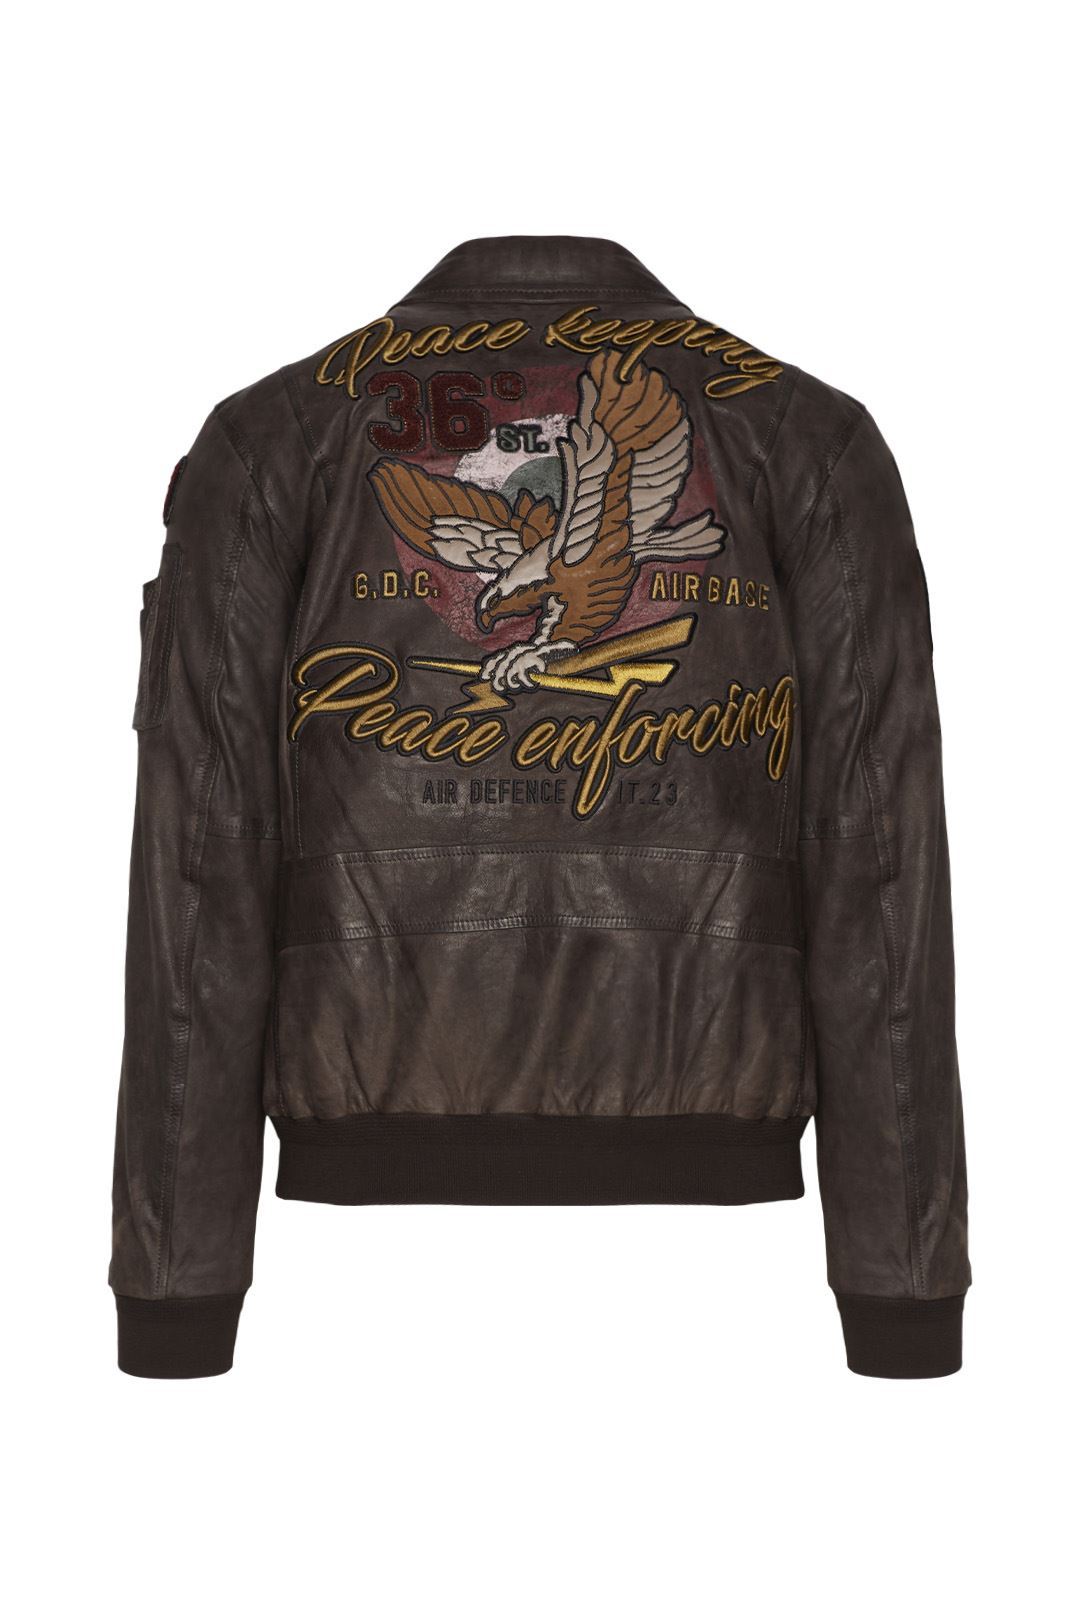 Printed Leather Jacket                        2